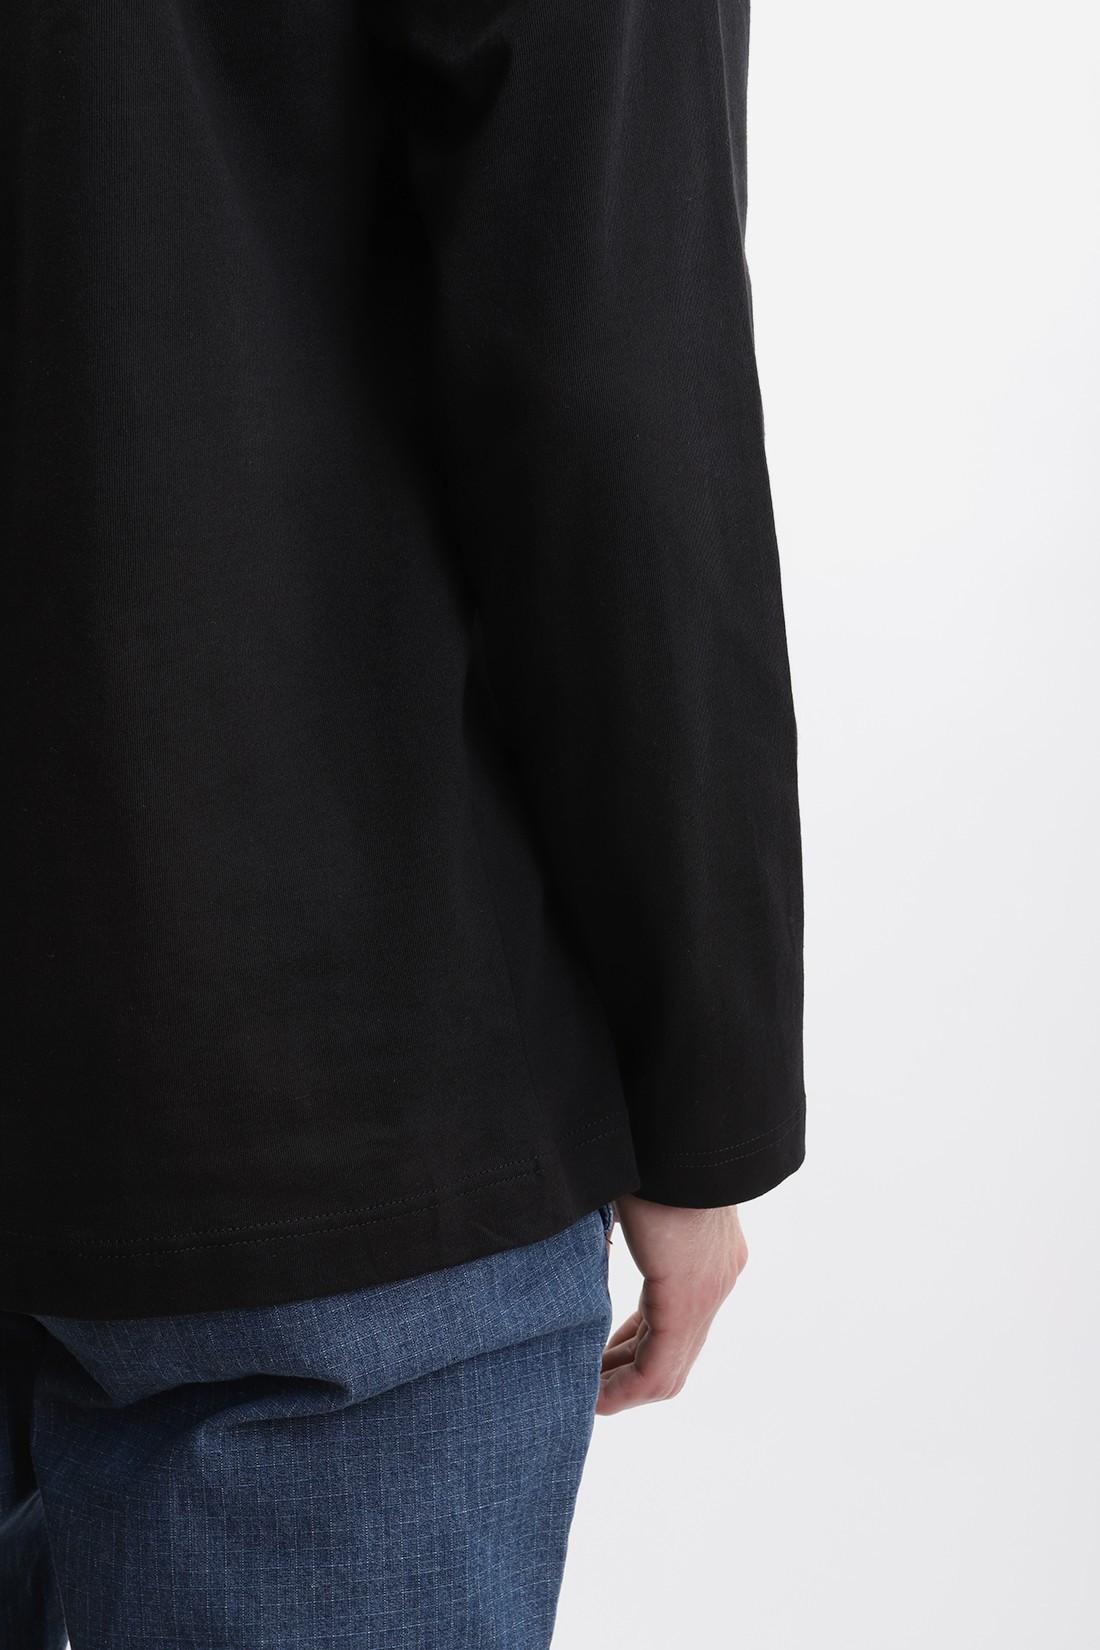 COMME DES GARÇONS SHIRT / Mens ls t-shirt w28115 Black